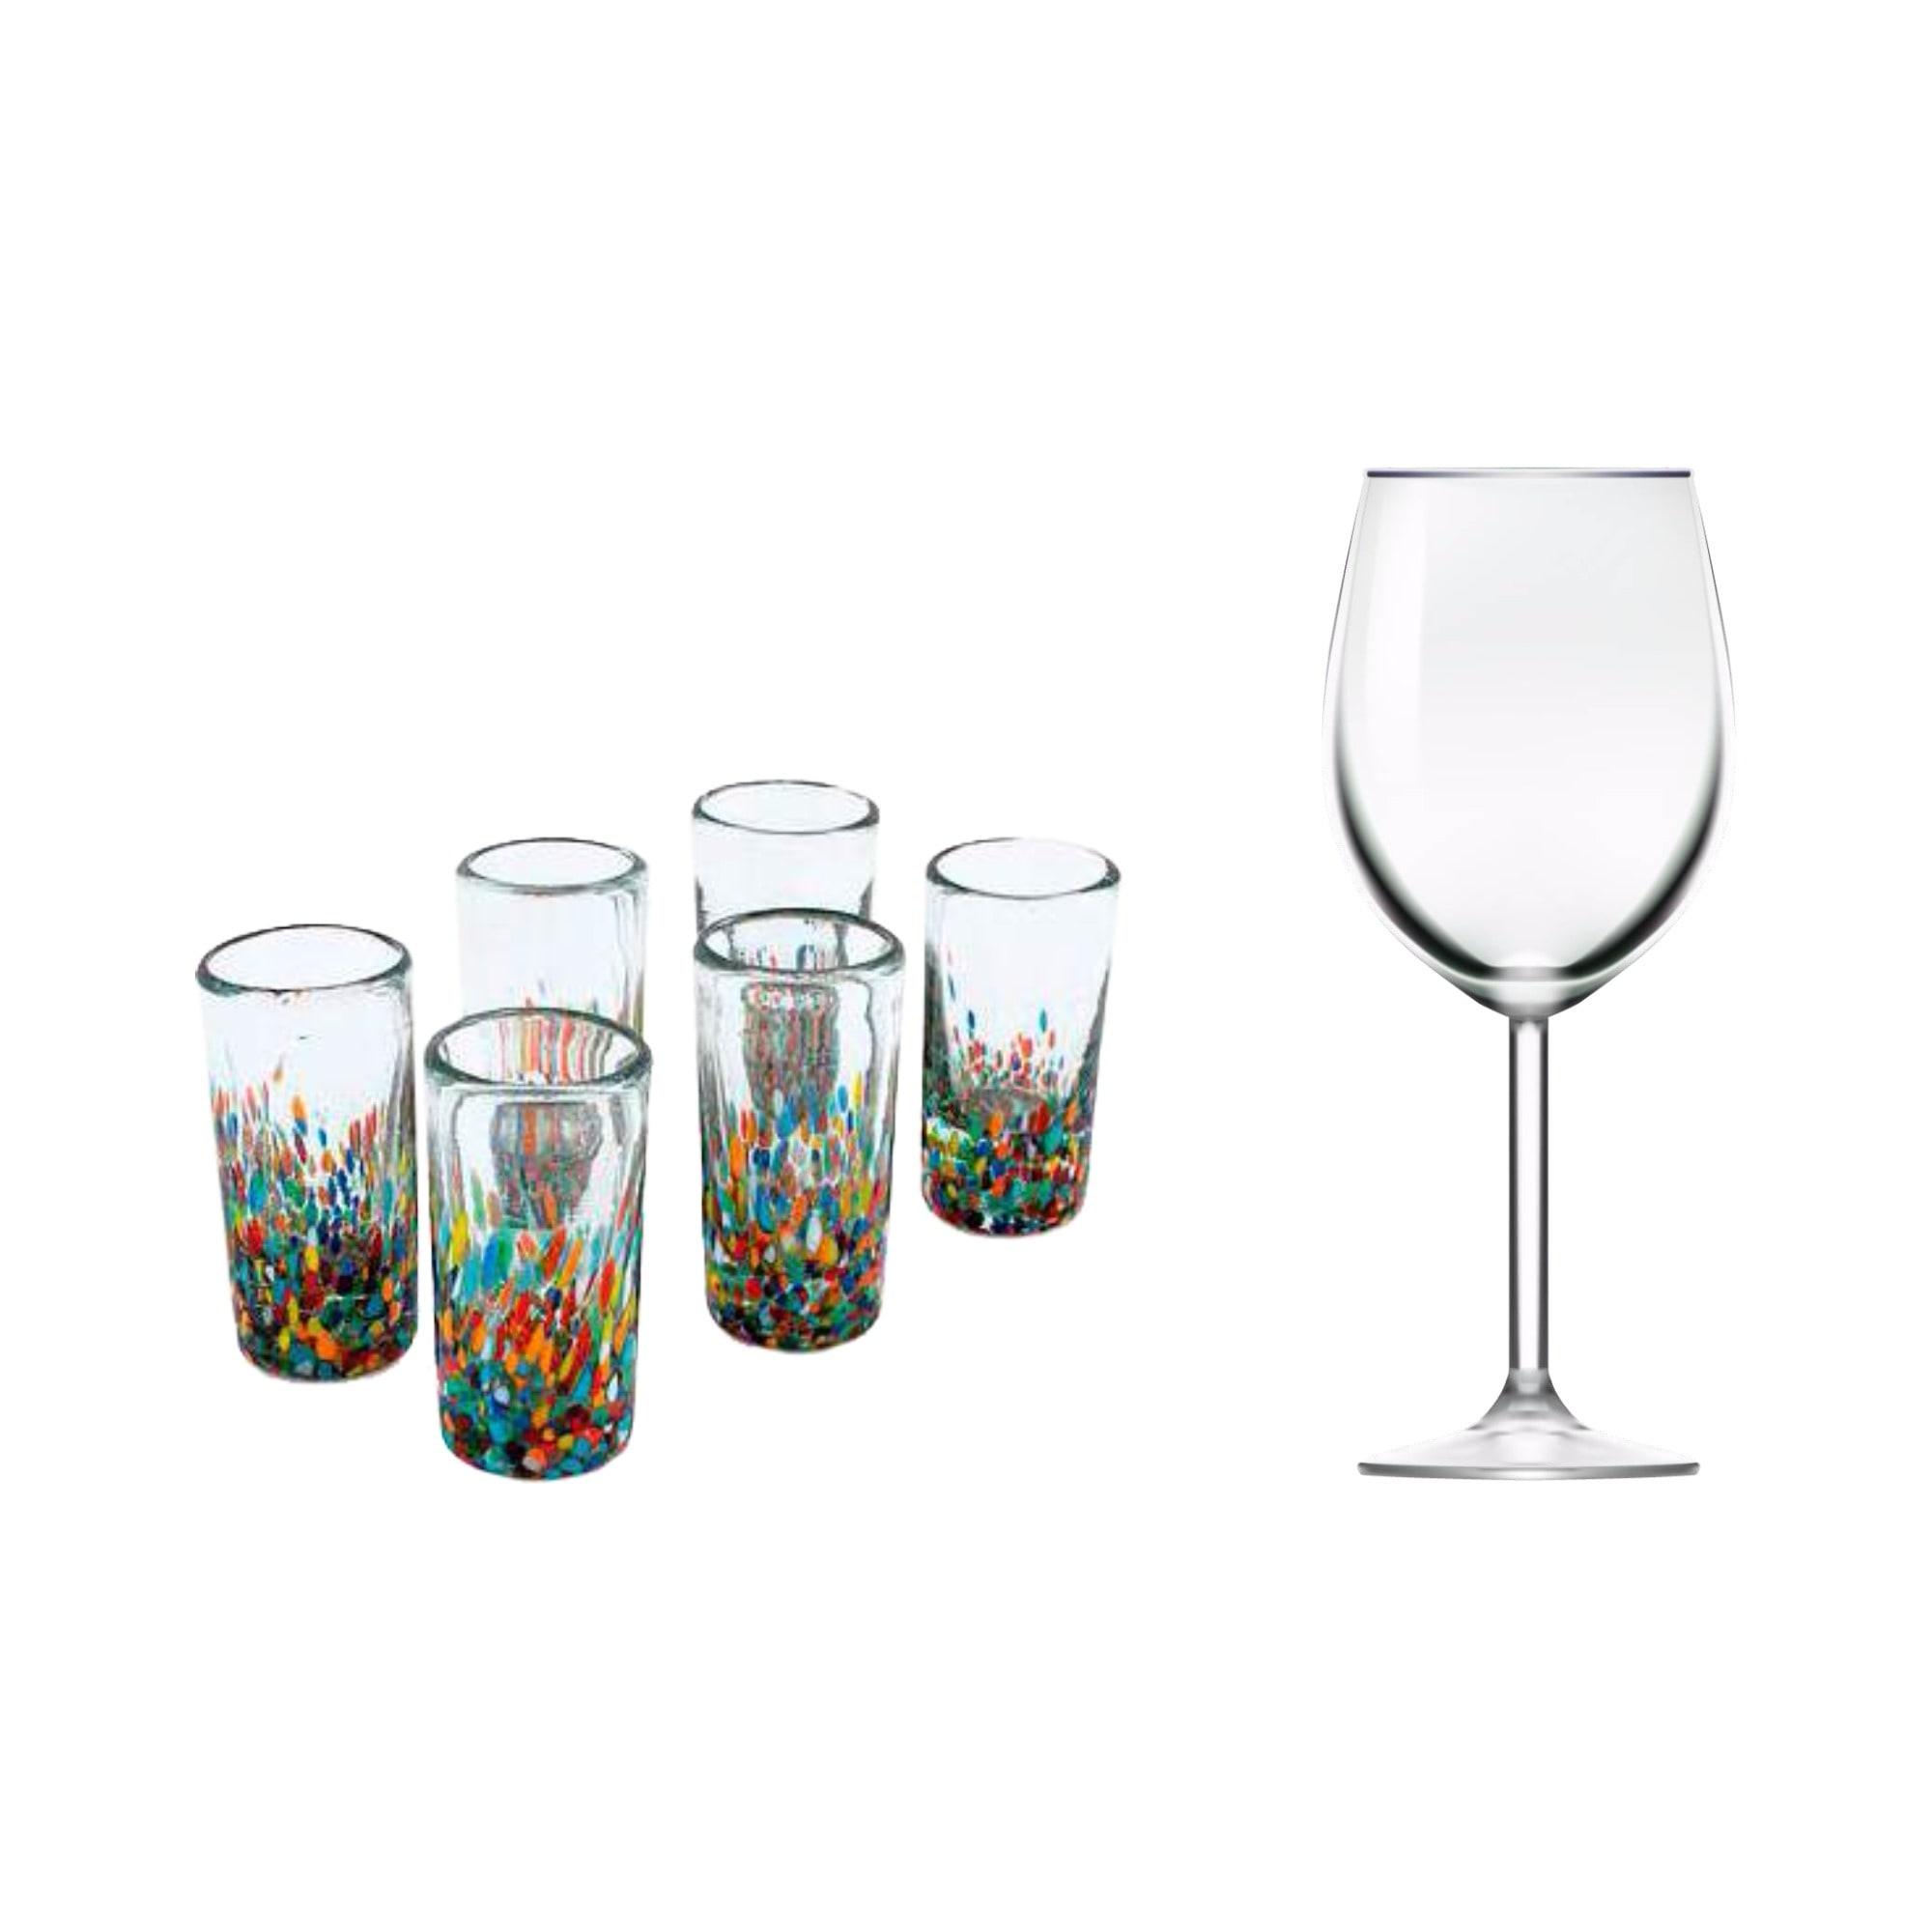 decor los fullxfull sugar skull dog listing de shot set dia decorative glasses of glass muertos zoom il fole